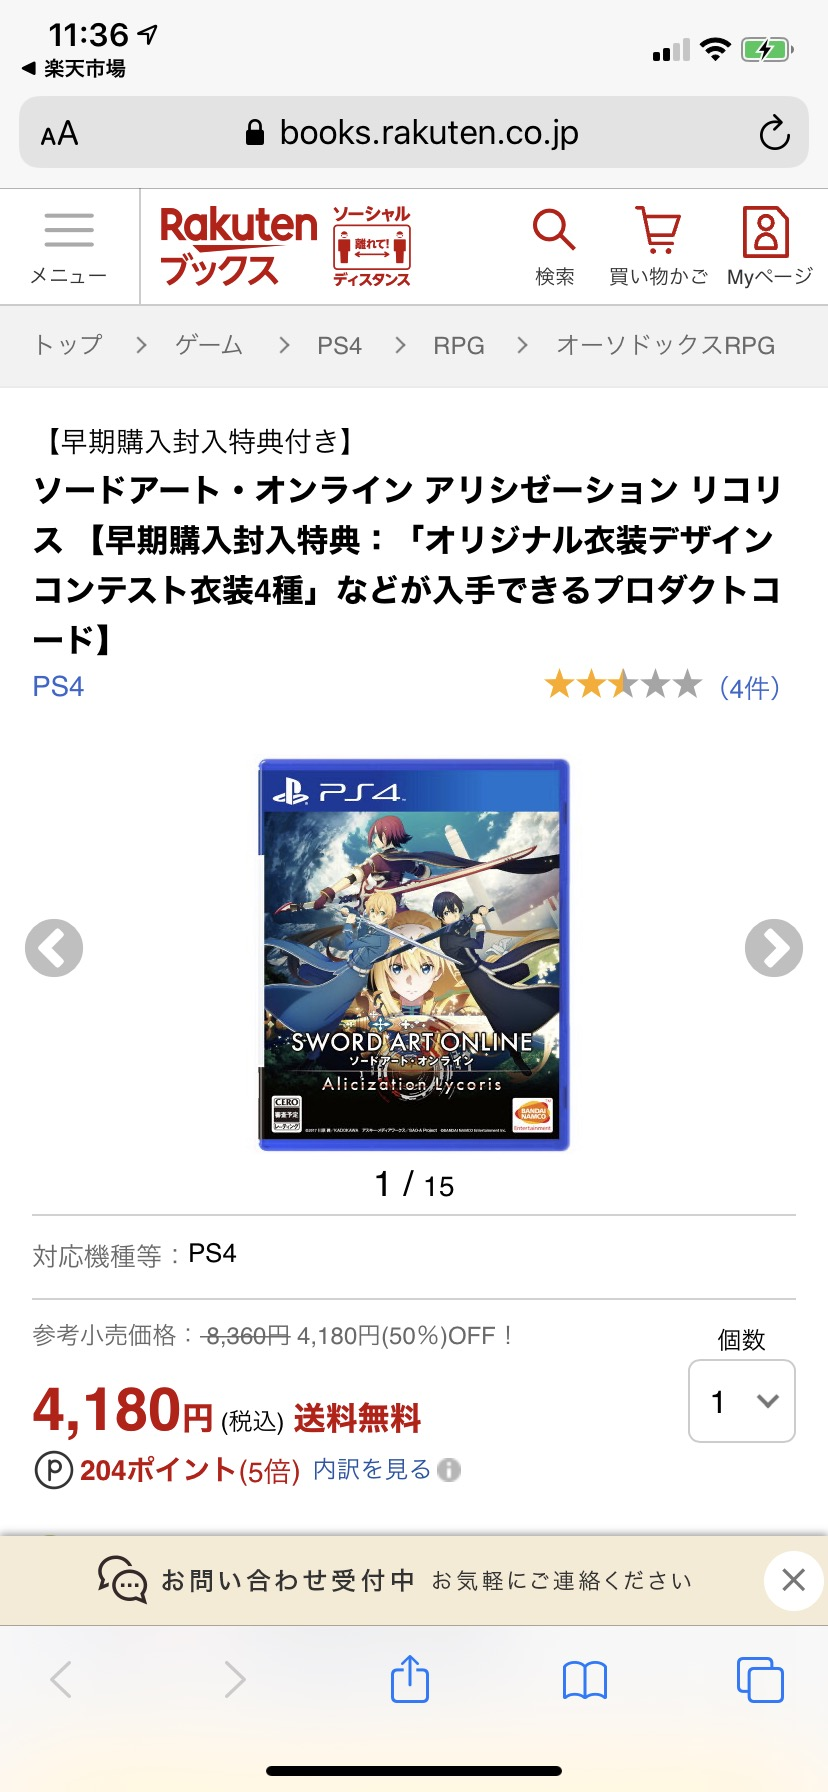 RQmqzZt - 【悲報】PS4「SAO新作」、発売から3週間で定価43%オフ・新品4792円に値崩れ!!